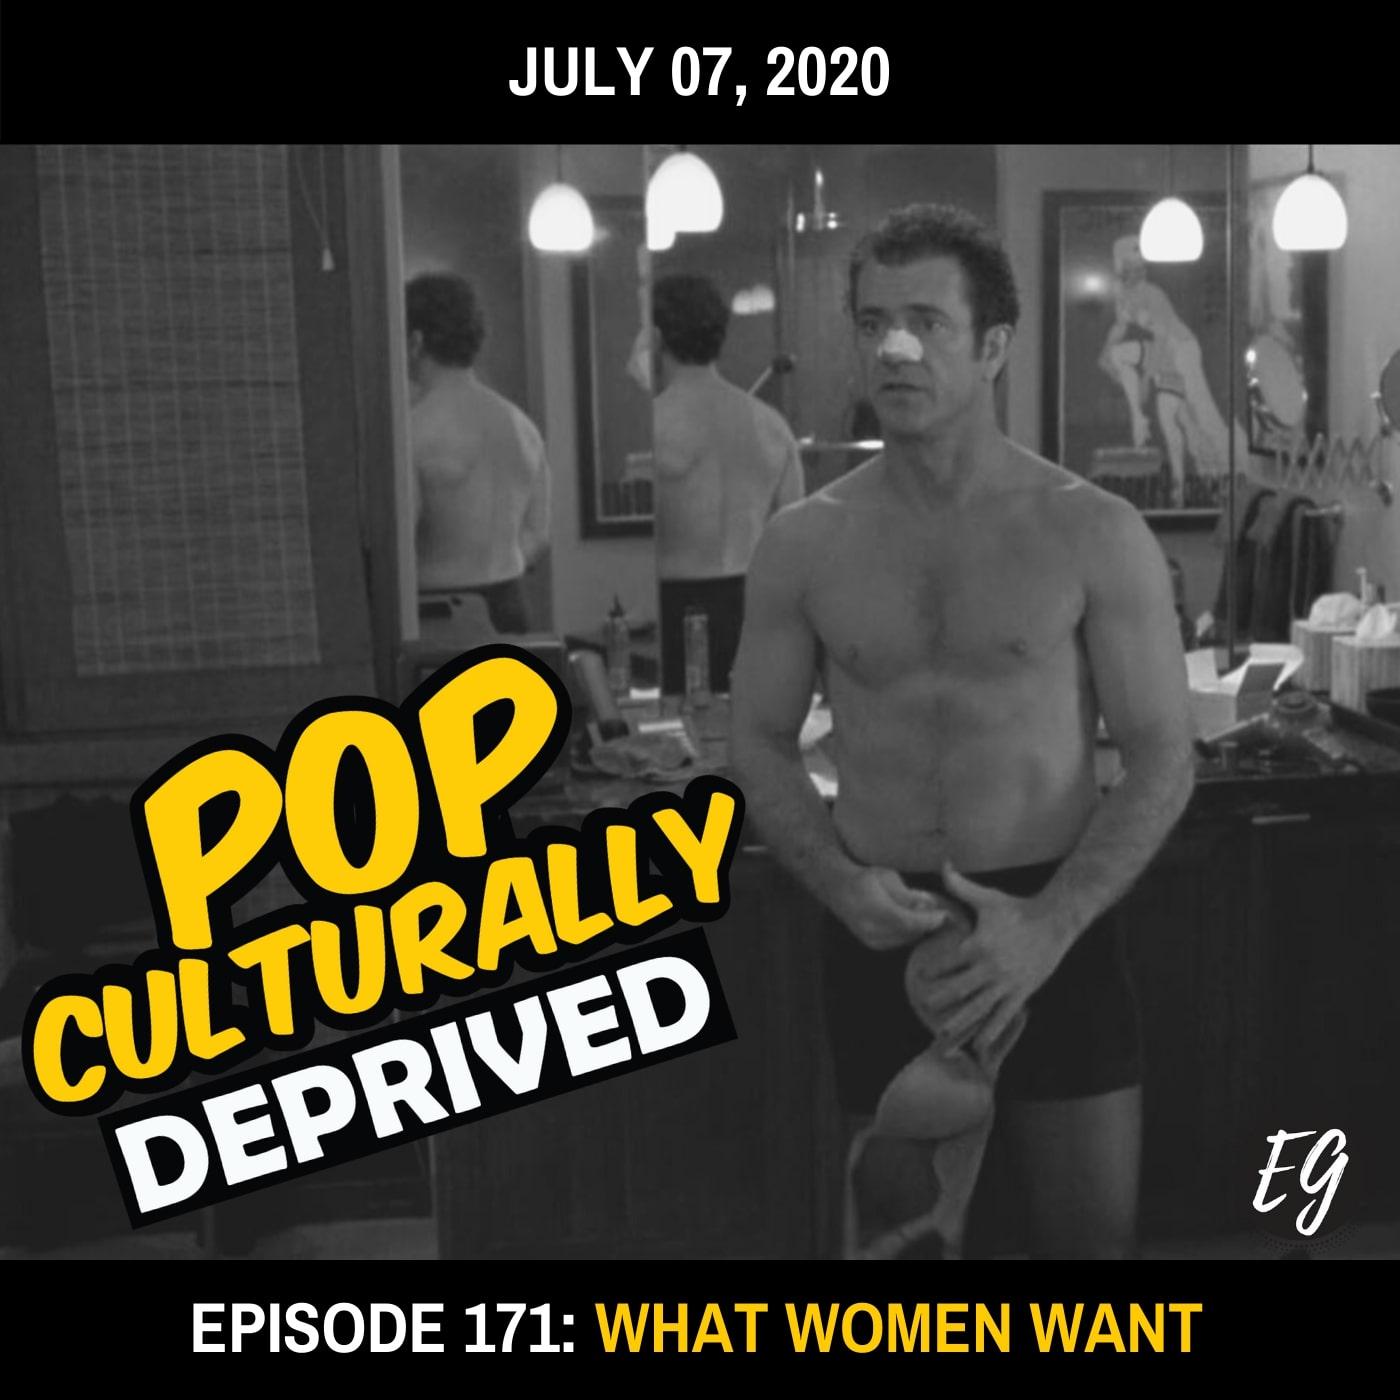 Episode 171: What Women Want